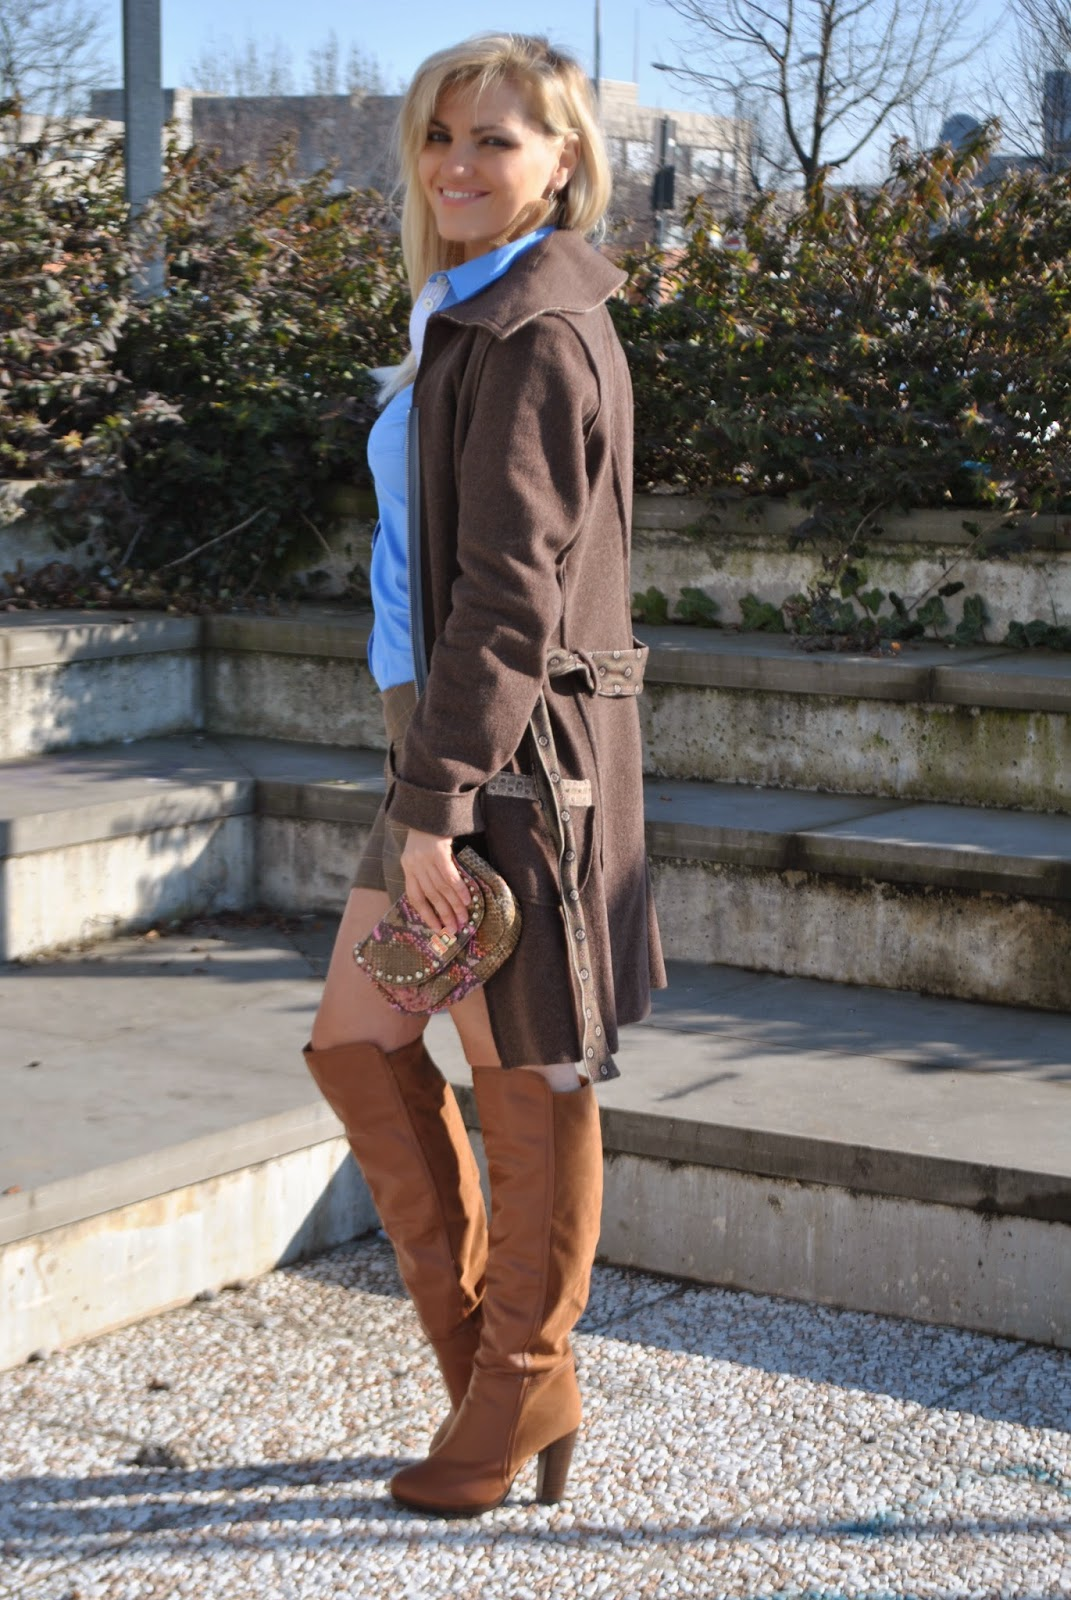 outfit febbraio 2015 outfit invernali mariafelicia magno colorblock by felym mariafelicia magno fashion blogger color-block by felym fashion blogger italiane fashion blogger bionde winter outfits february outfit blonde girl fashion bloggers italy